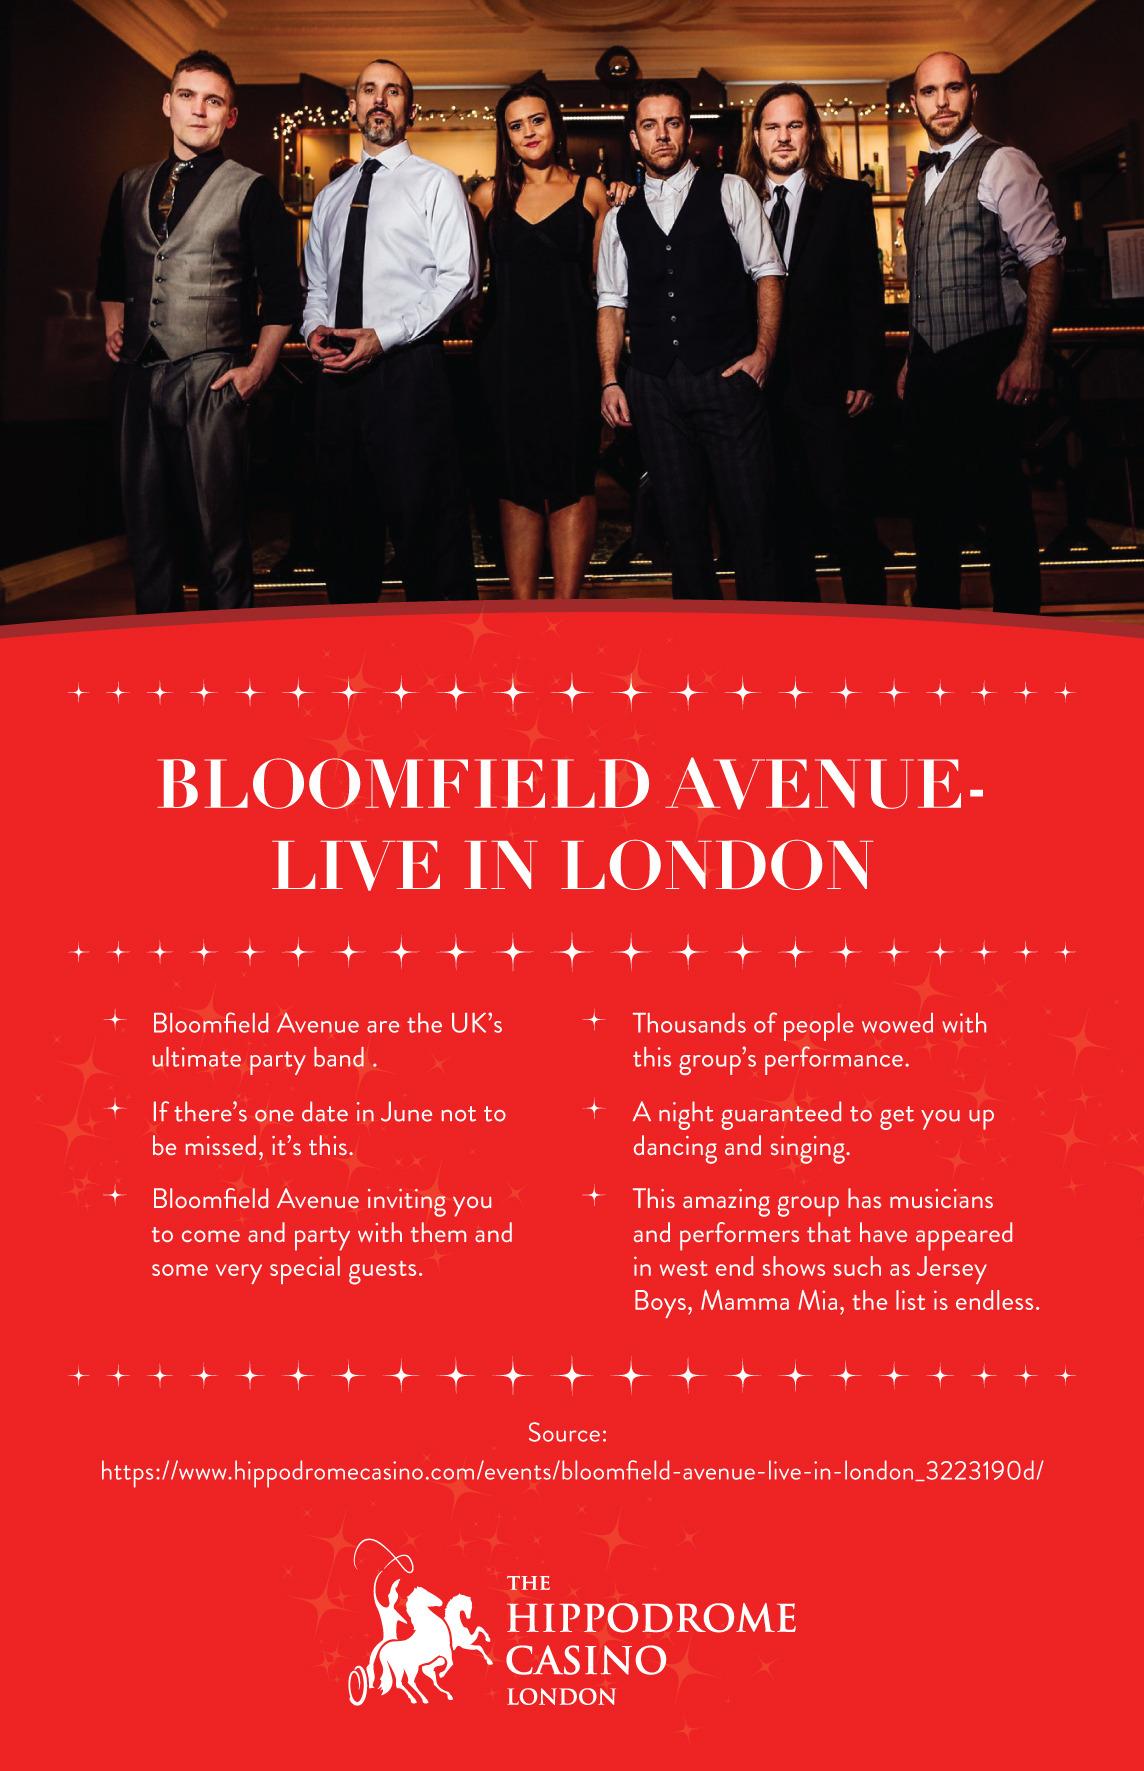 Hippodrome Casino — Bloomfield Avenue - Live in London